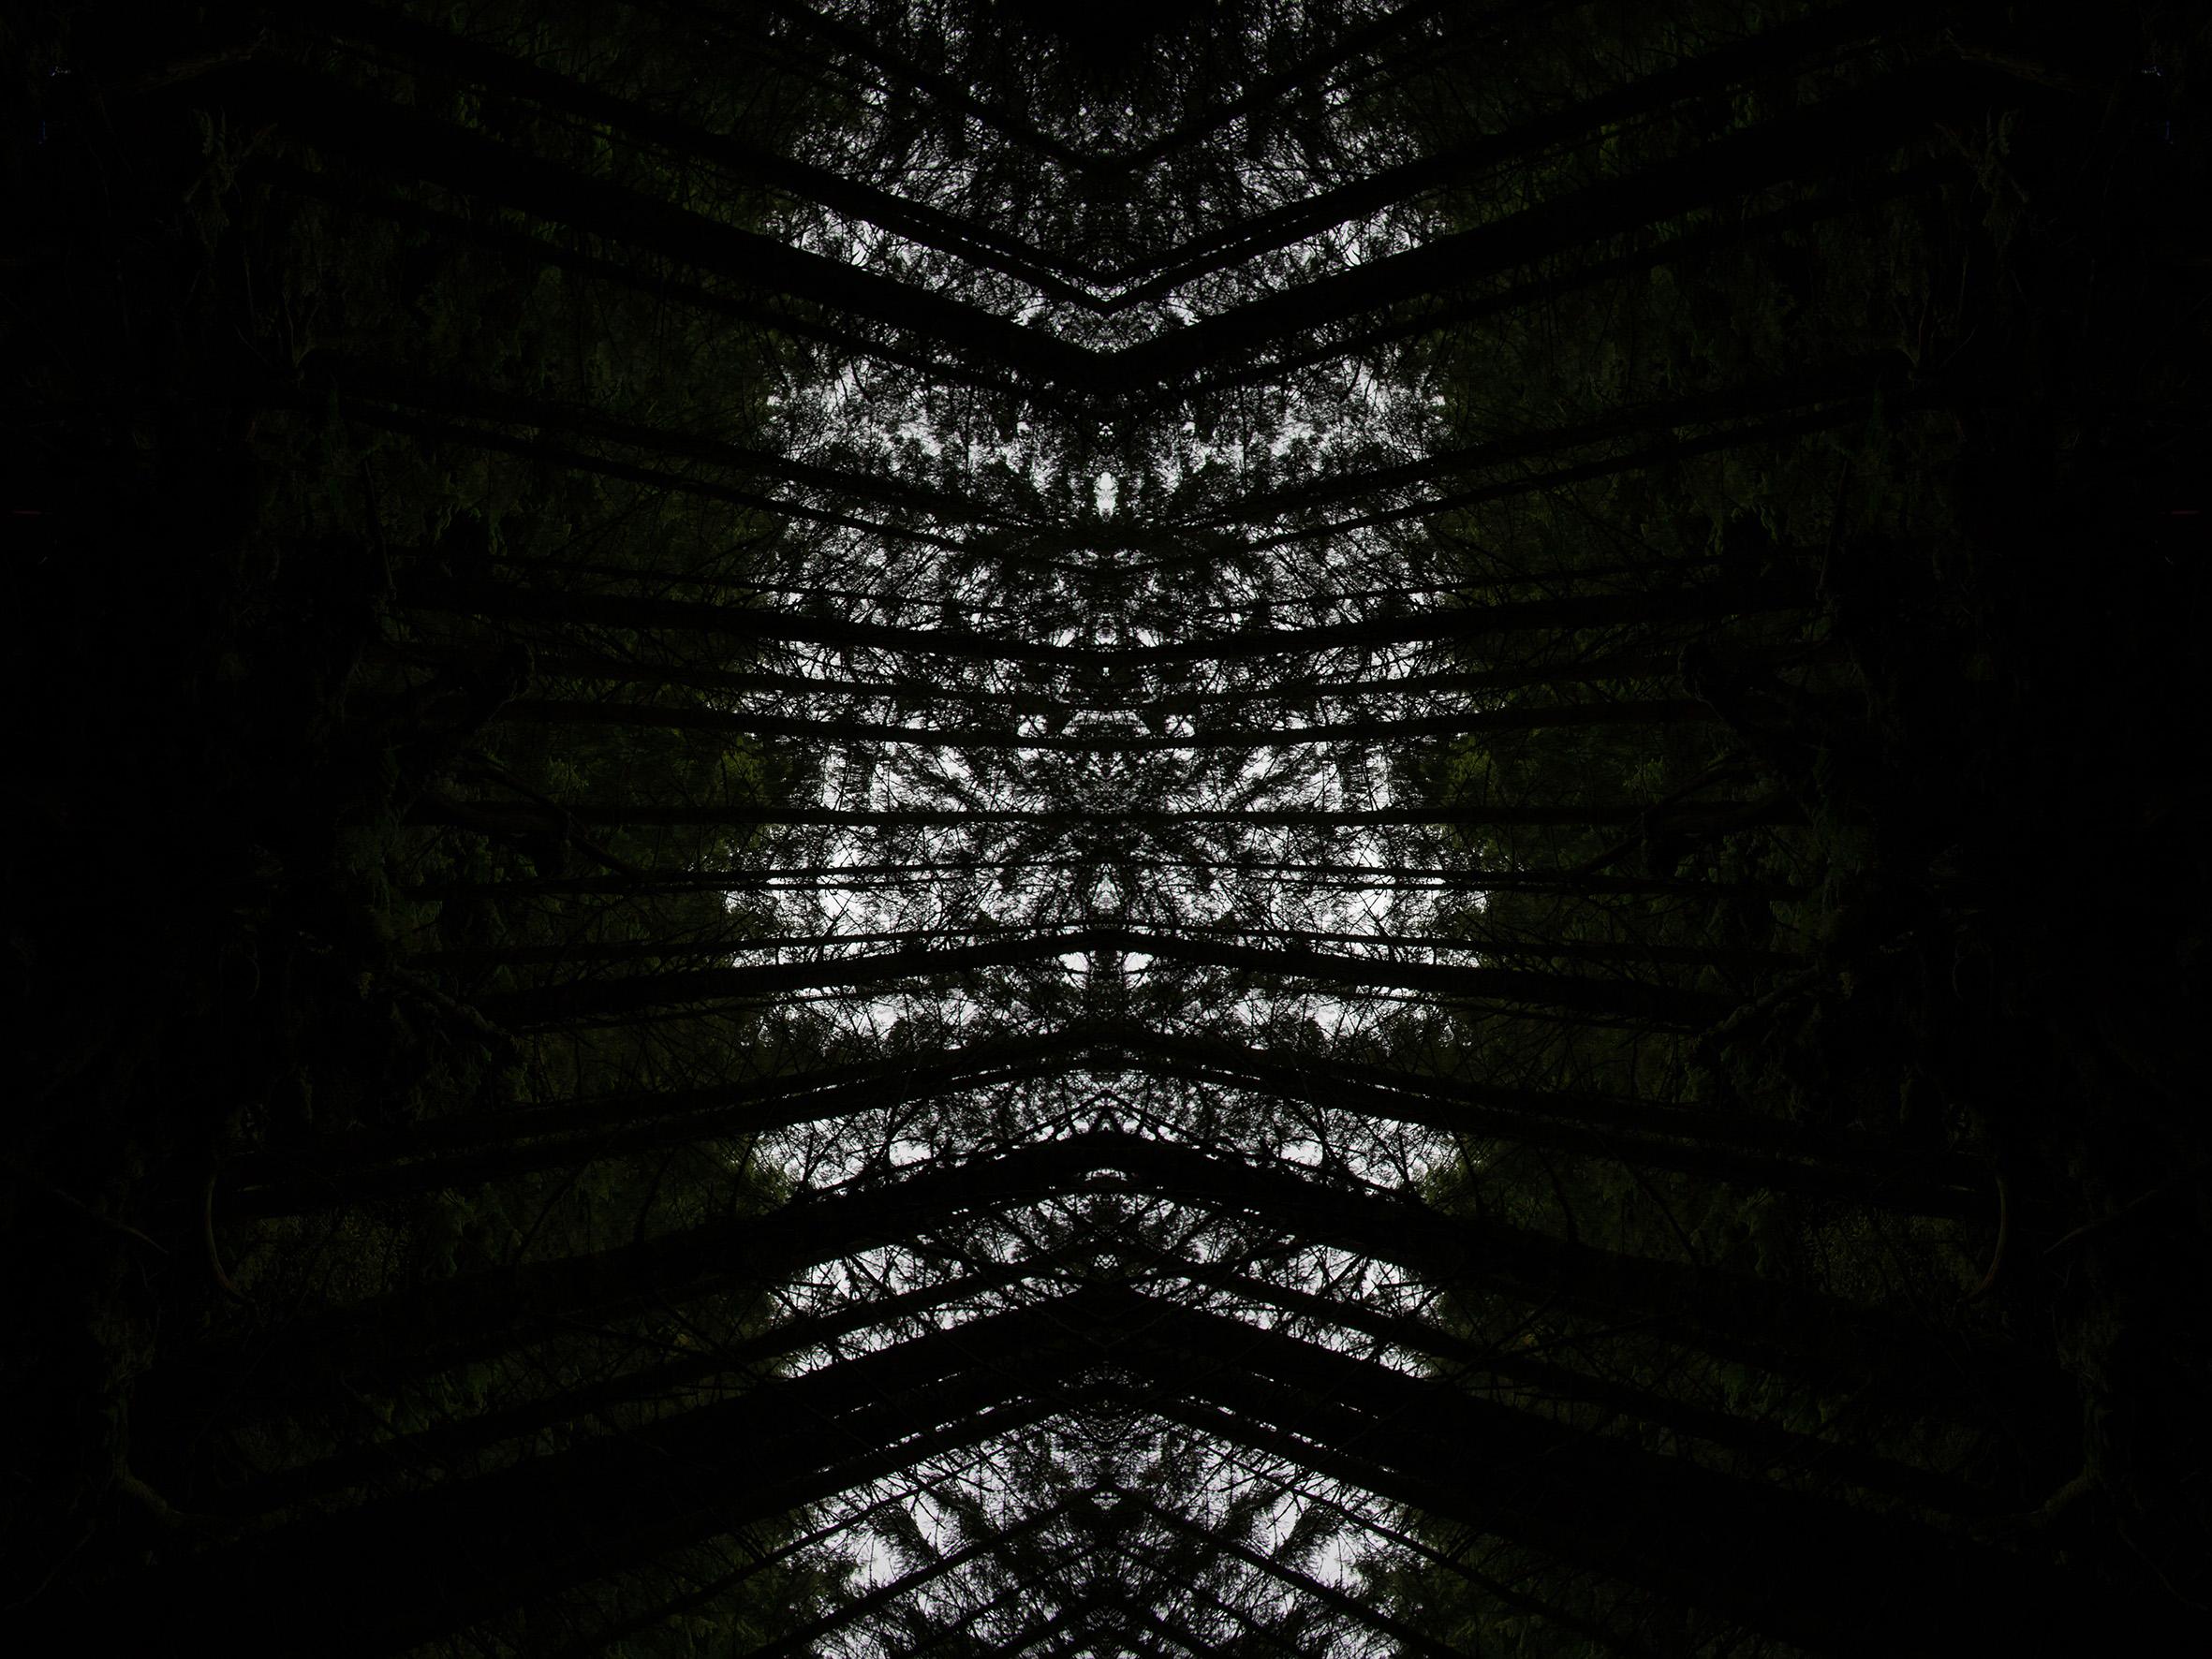 Mirror_Scotland-7.jpg